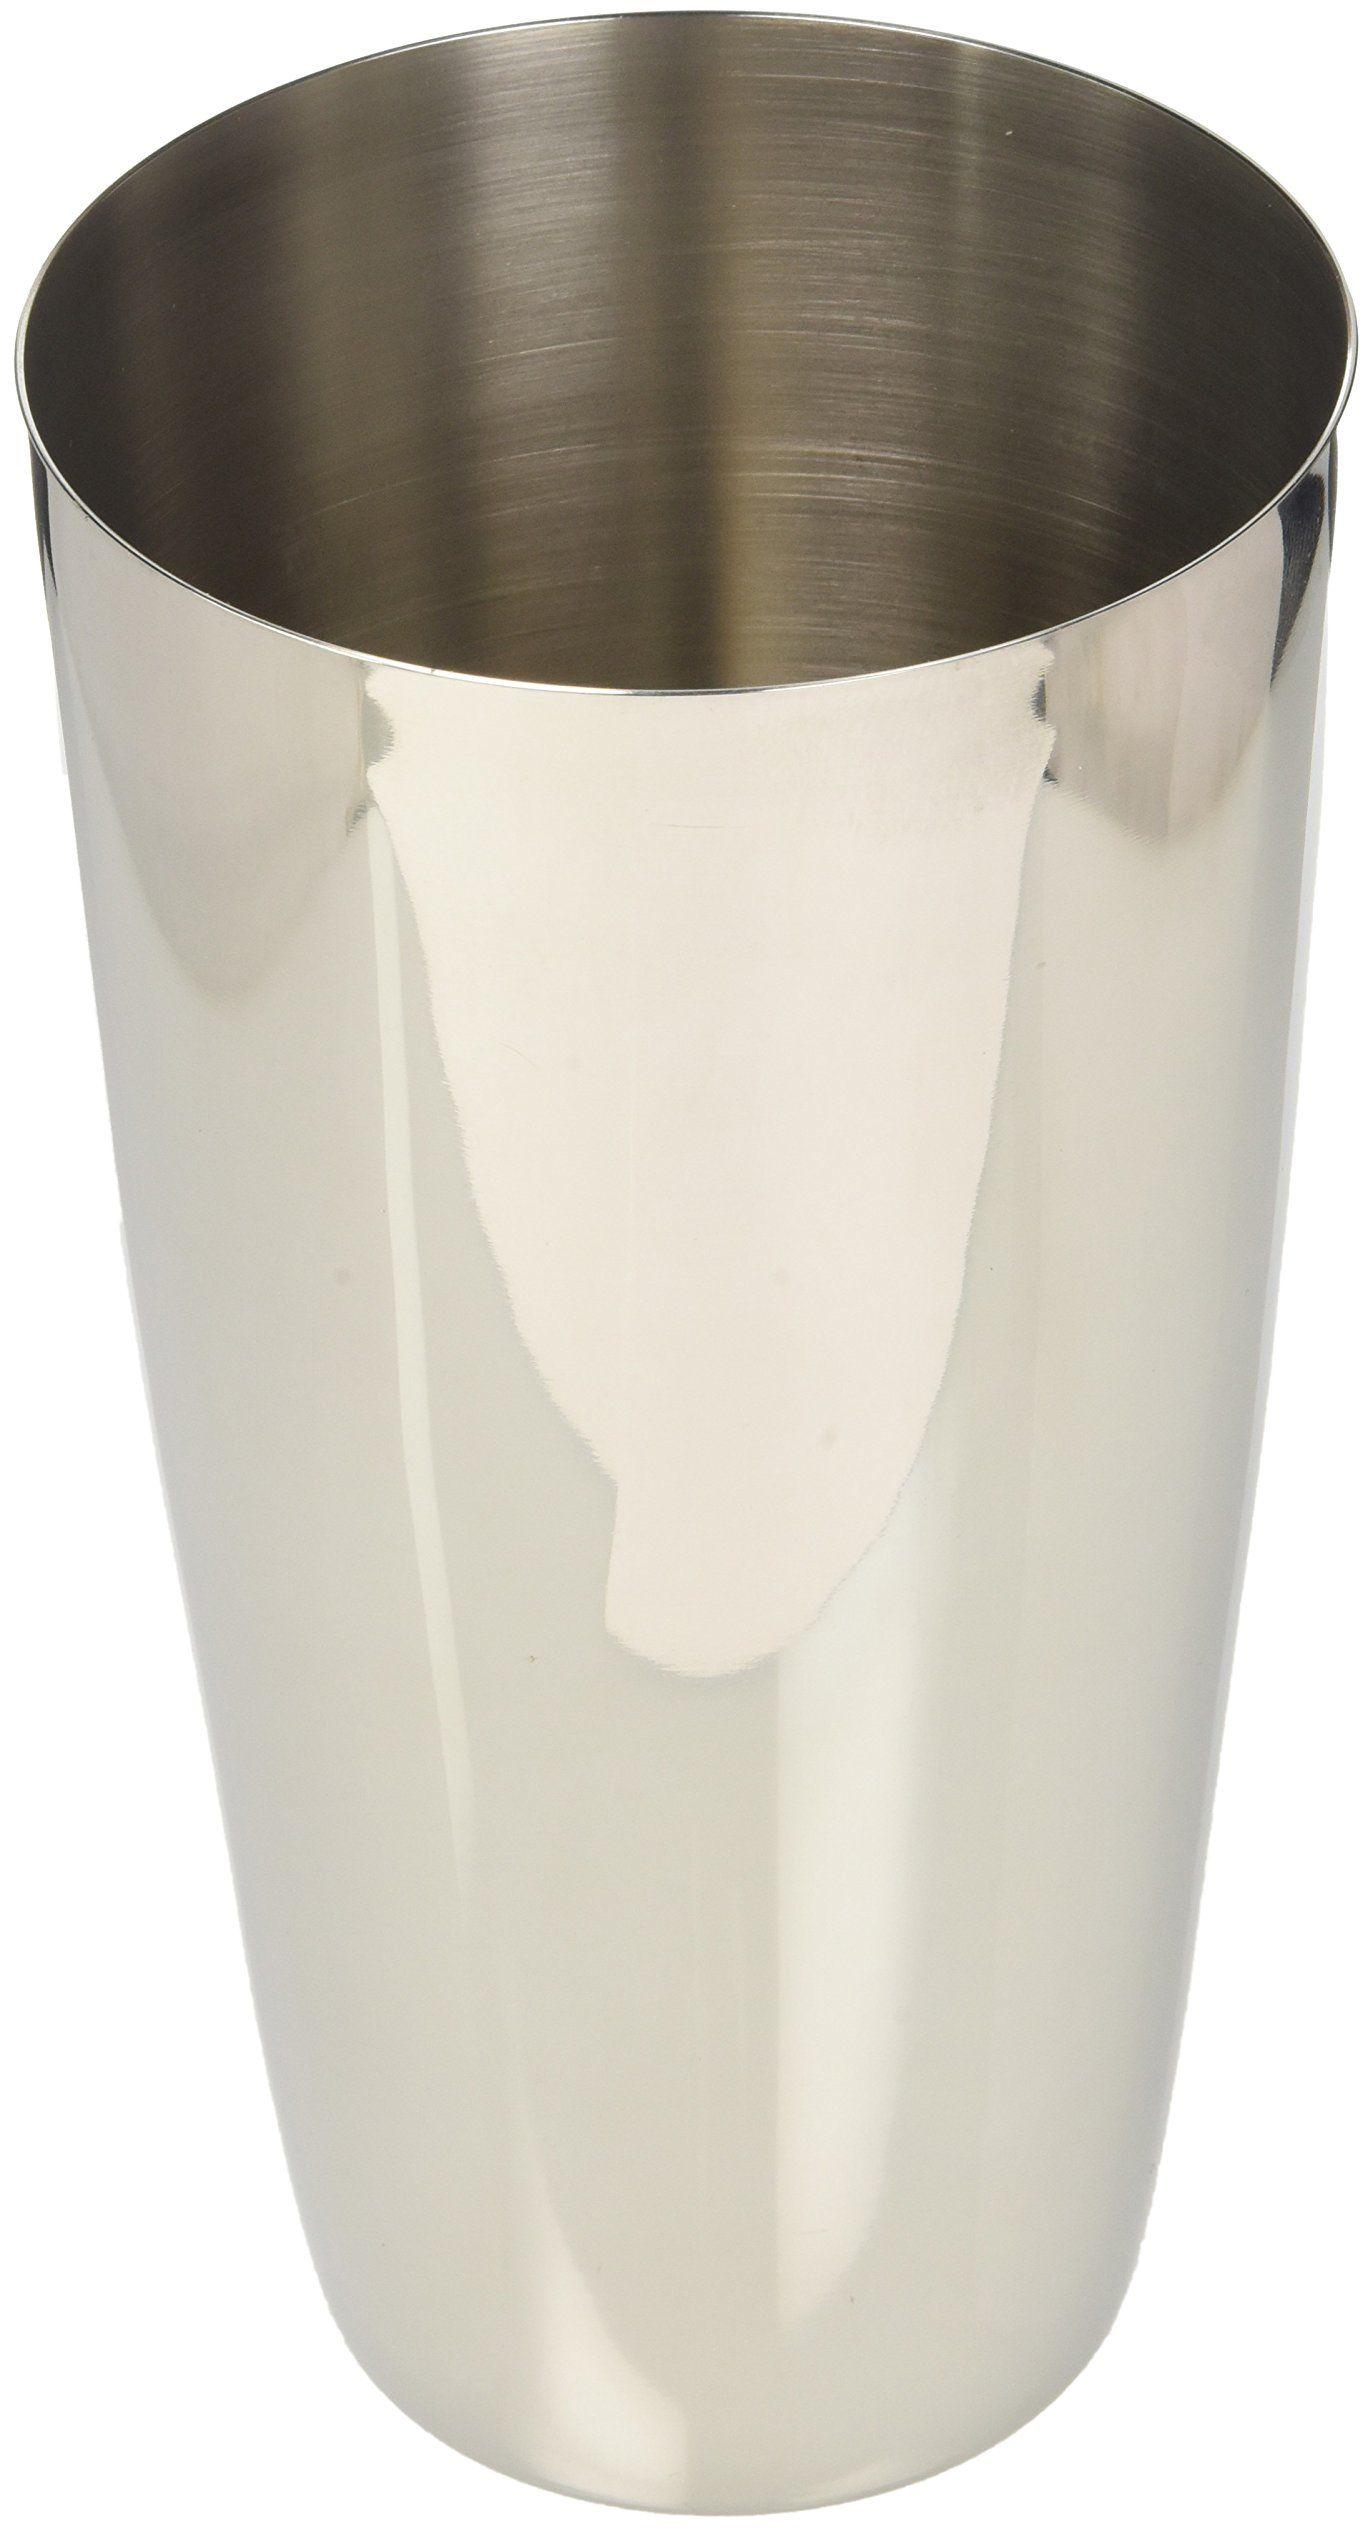 The Bars Bars Shaker 84 cl, stal nierdzewna, szary, 9 x 9 x 17 cm